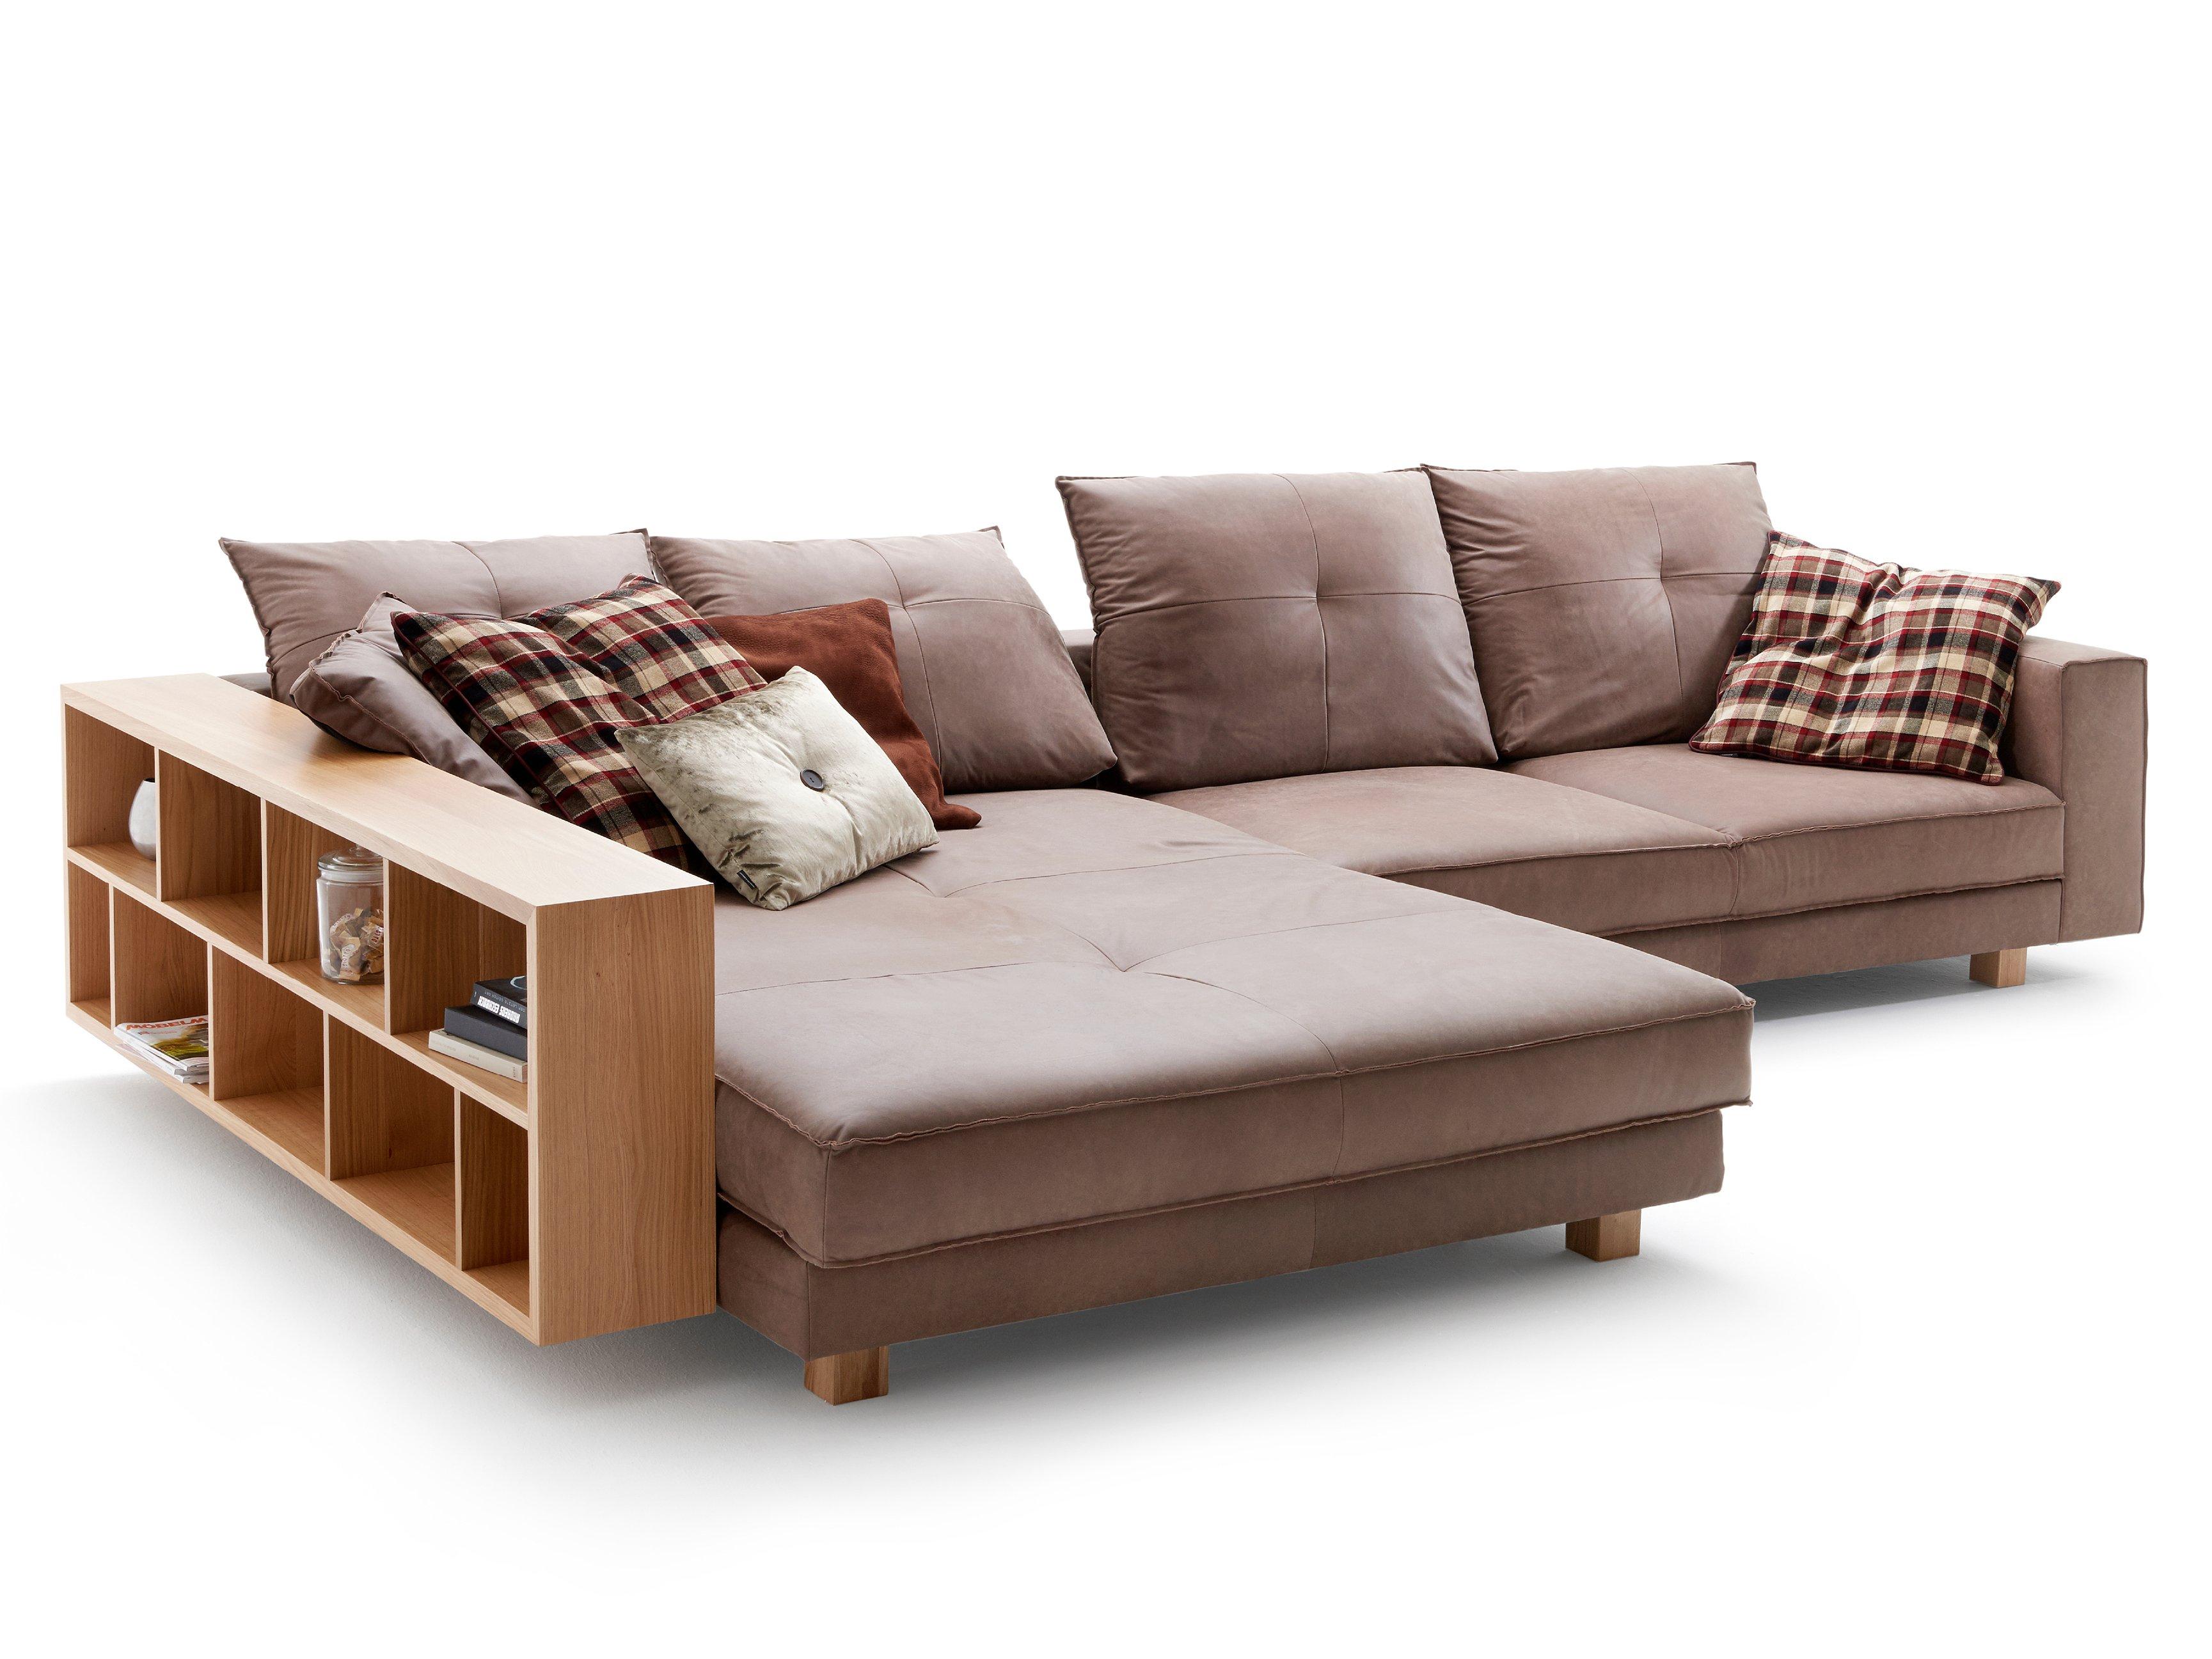 Sortiment | Polstermöbel | Sofa | Couch